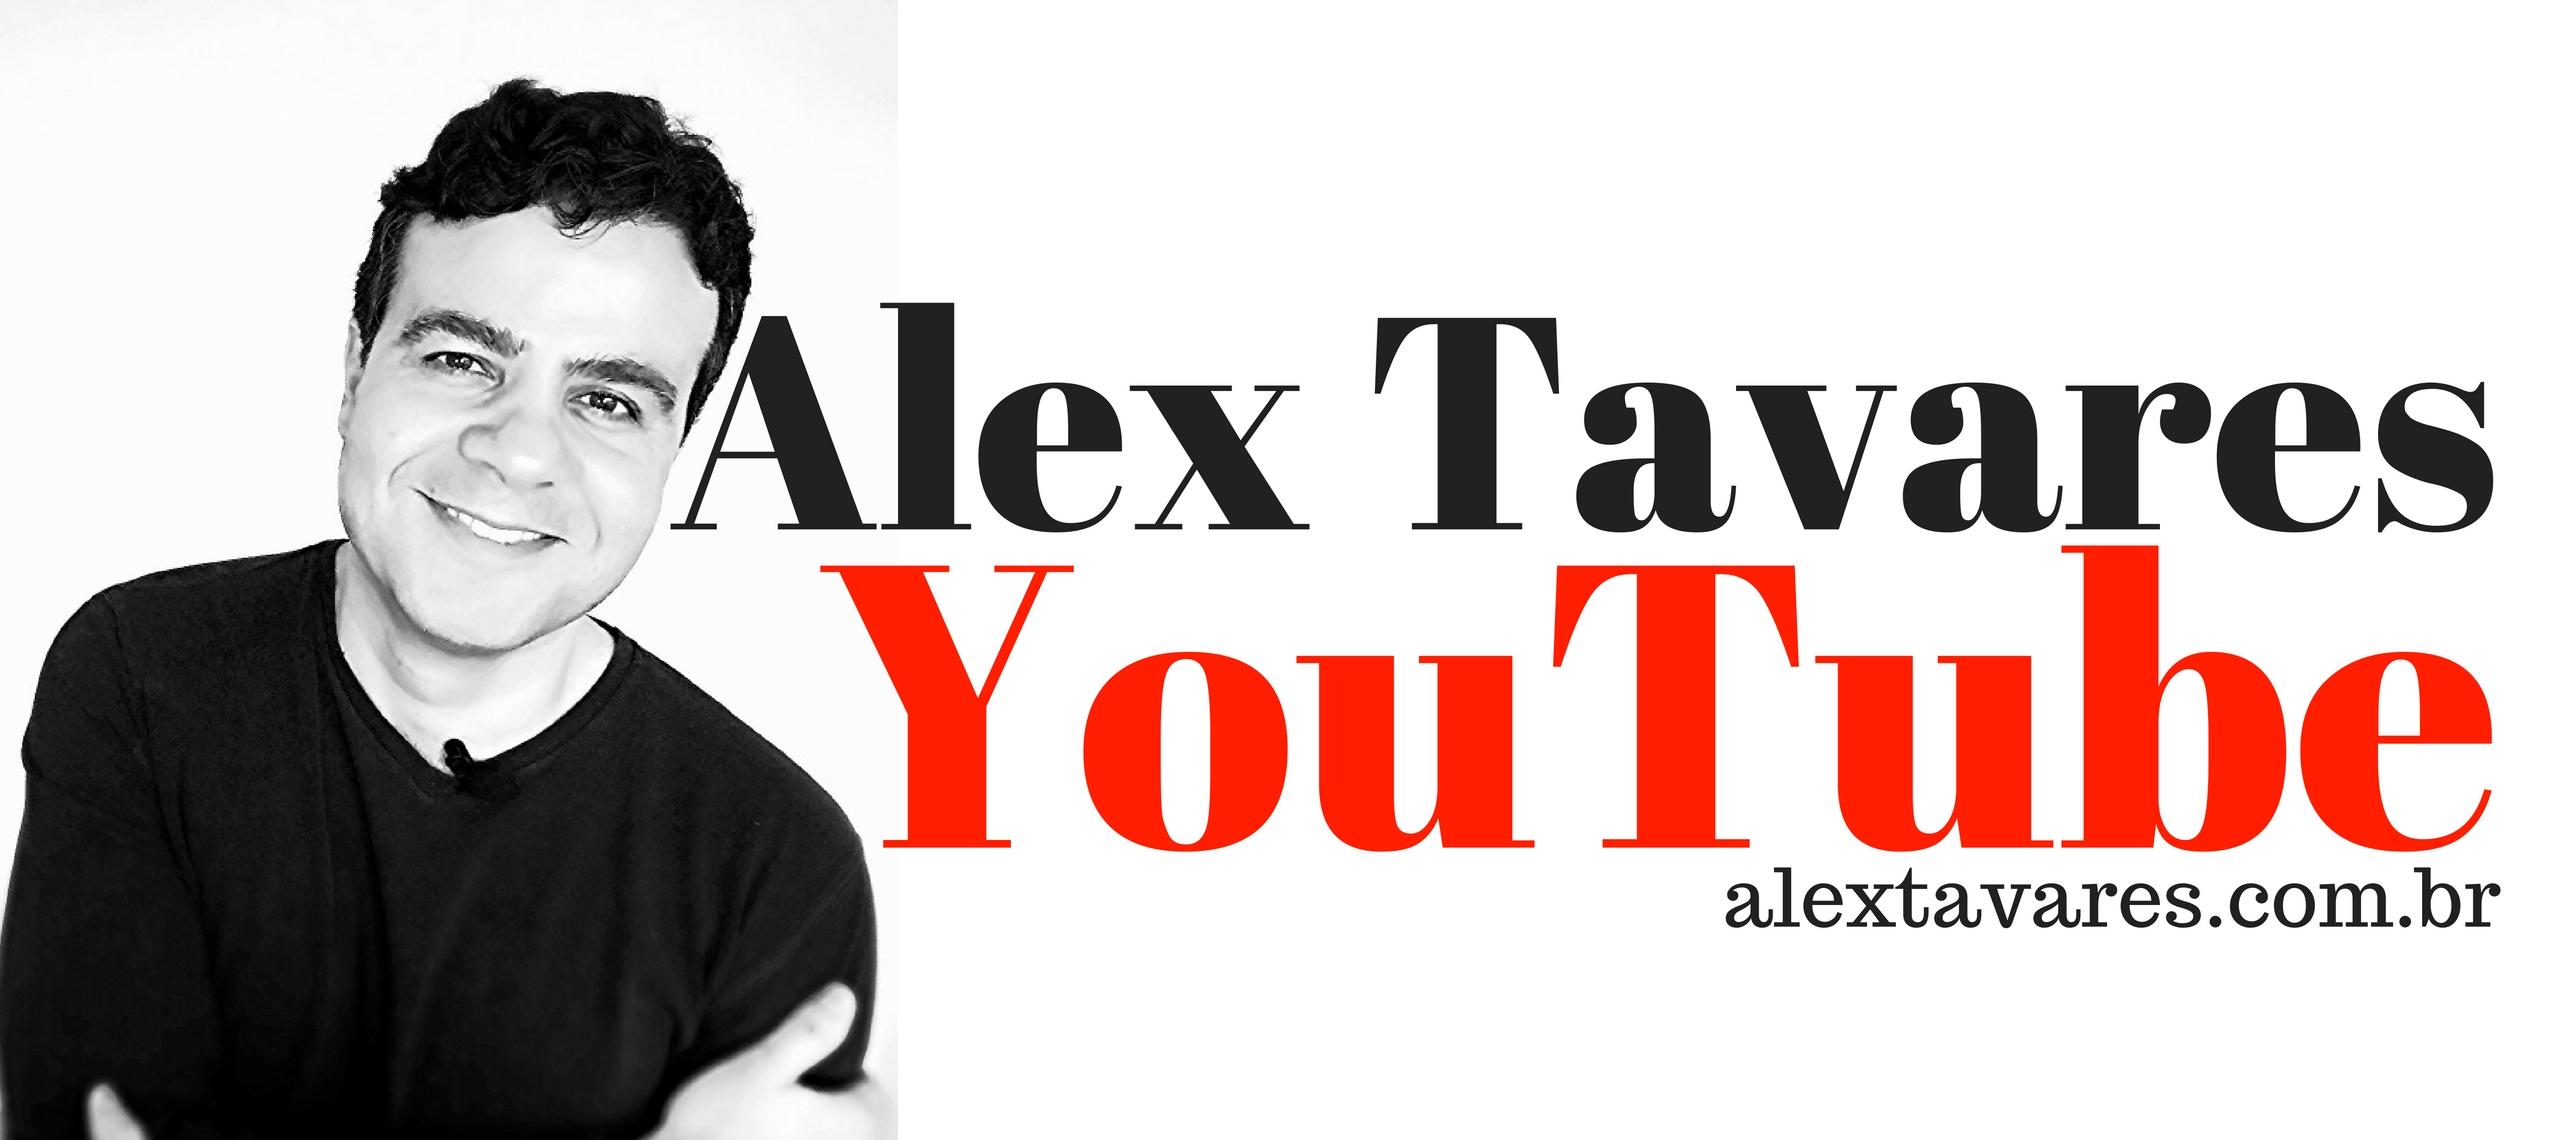 Alex tavares capa youtube